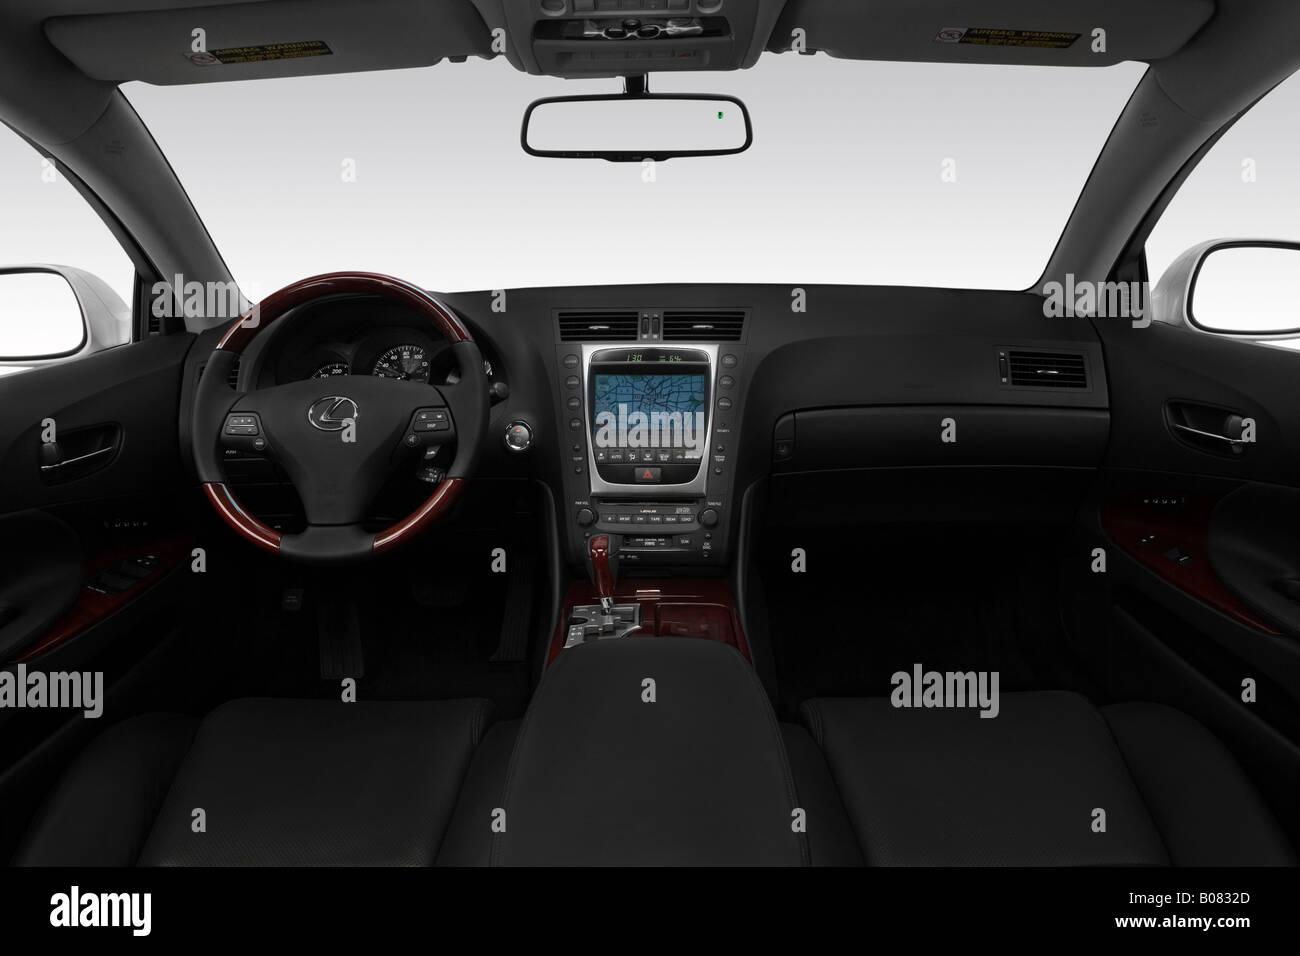 2008 Lexus GS GS450h in Gray - Dashboard, center console, gear Stock ...